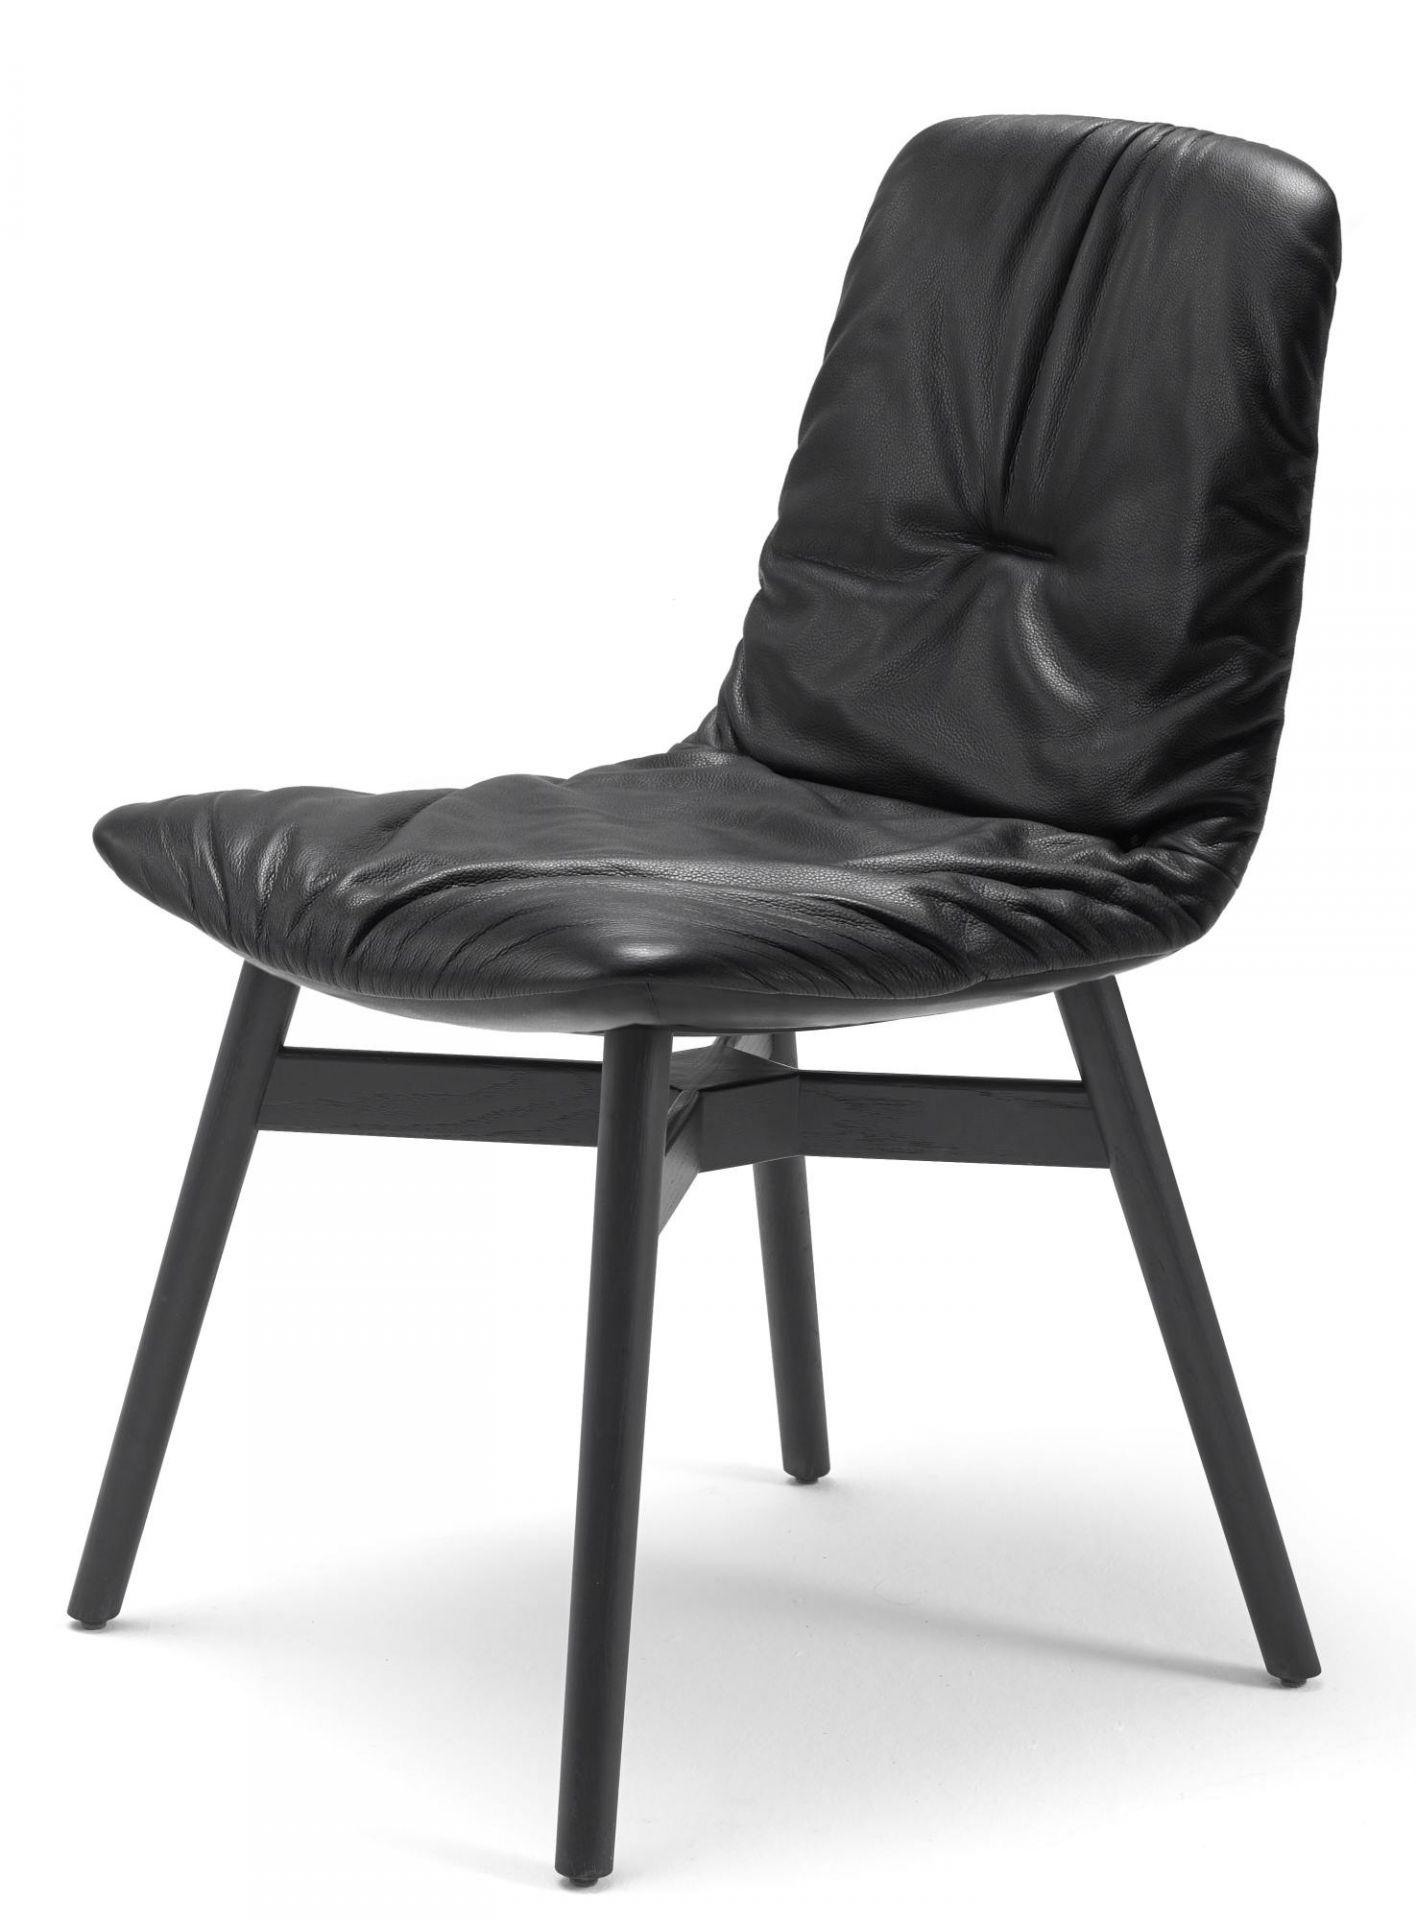 Leya Stuhl Freifrau Sitzmöbelmanufaktur